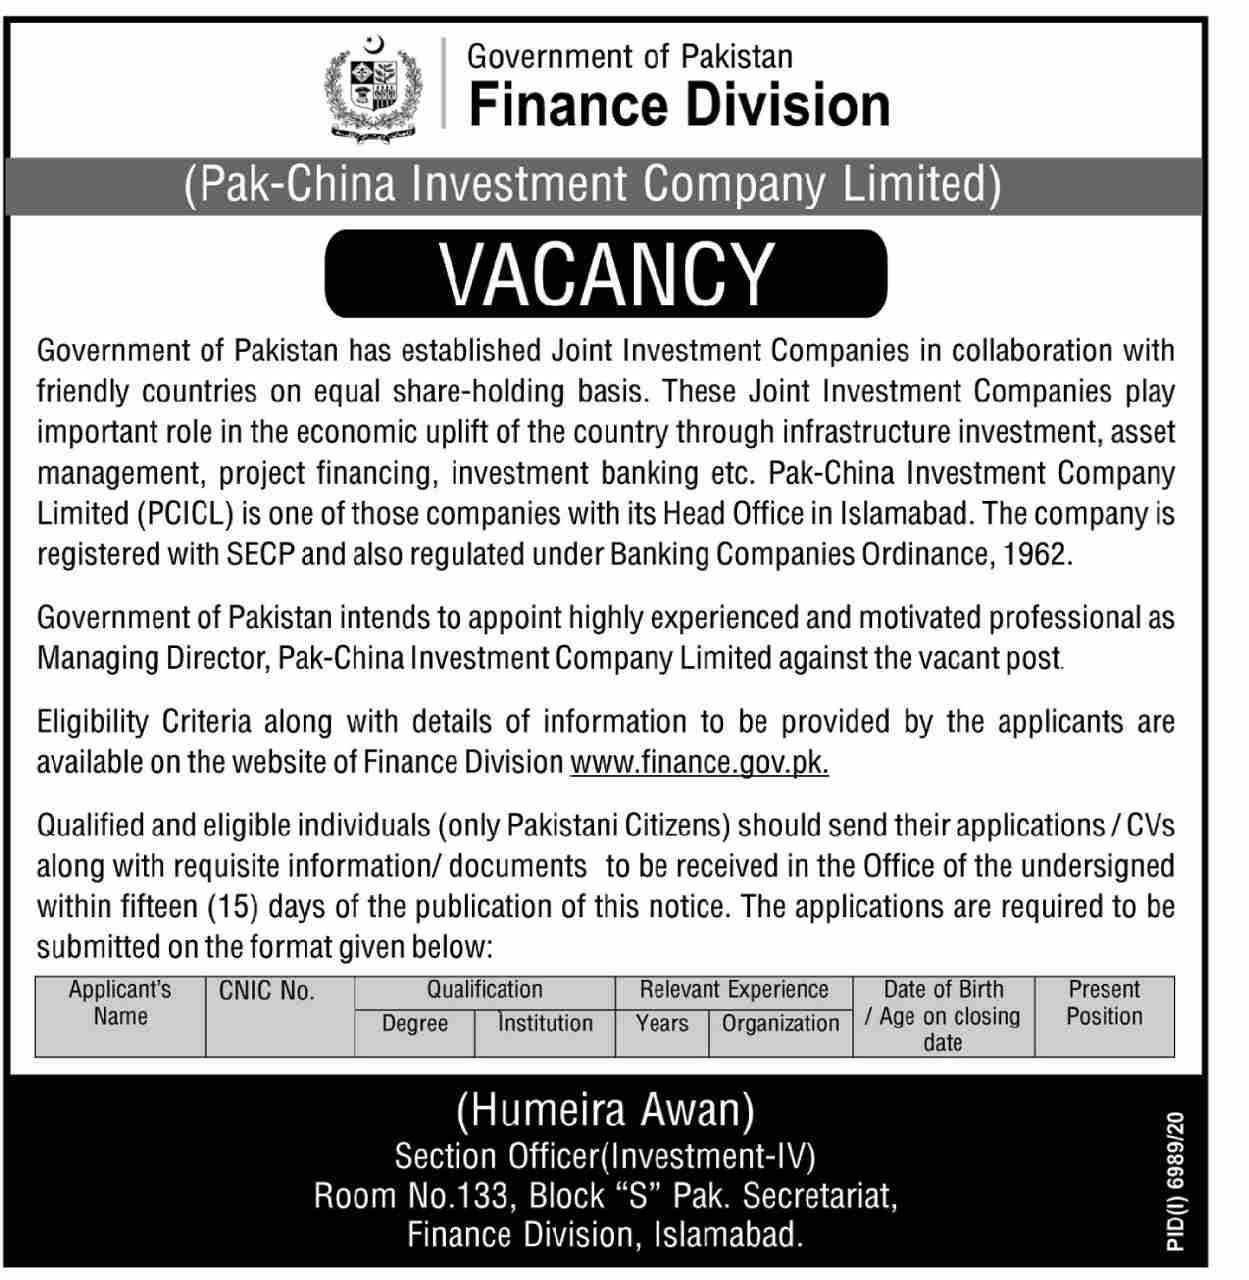 Wazarat Khazana Jobs 2021 Apply Now Finance Division Government of Pakistan Jobs 2021 (Pak China Investment Company Limited)